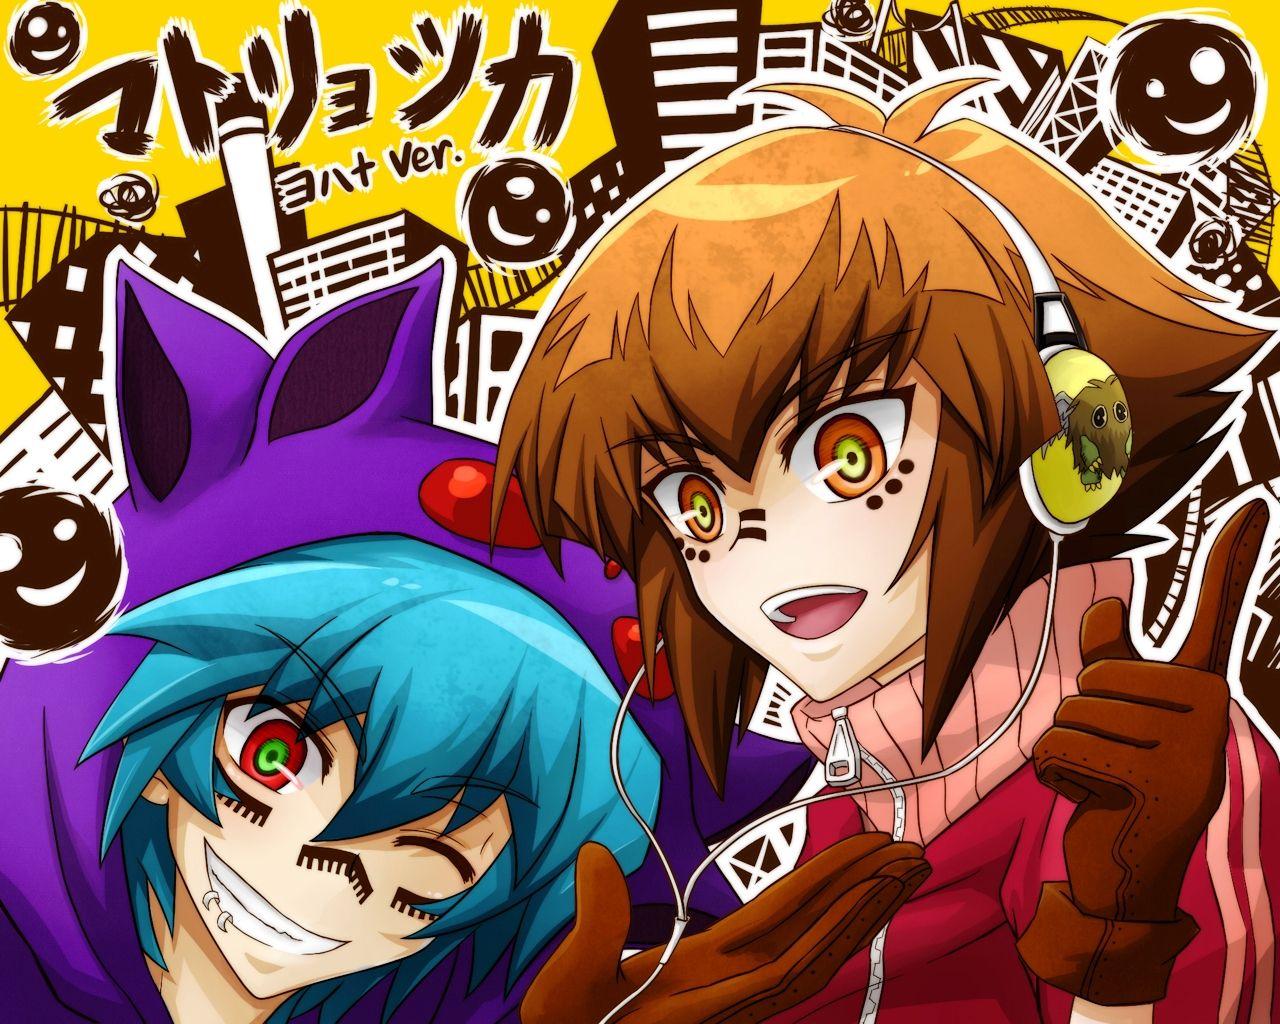 Yugioh GX jaden and John/Jesse Yugioh, Anime, Anime images